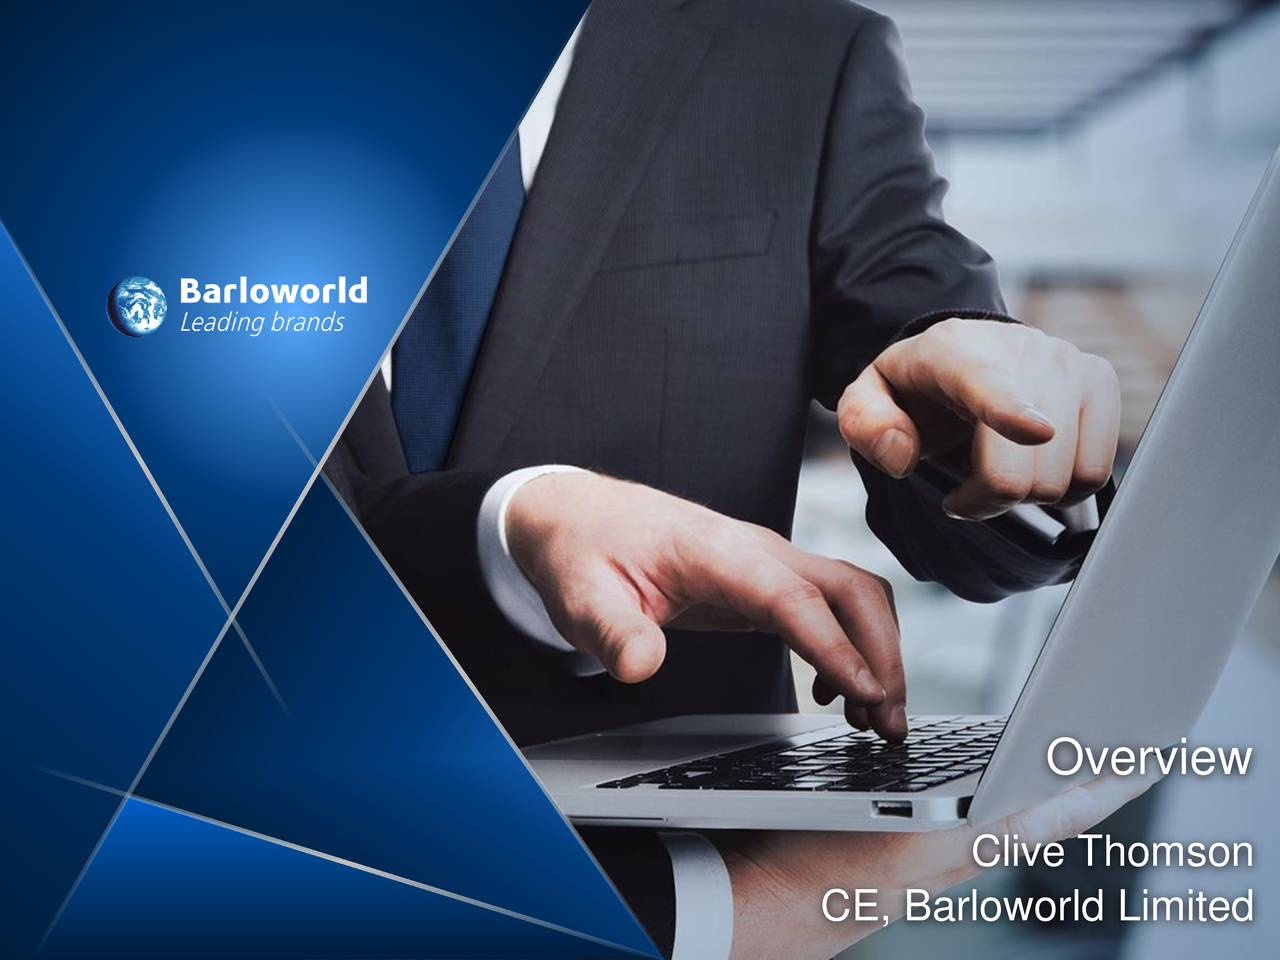 Clive Thomson CE, Barloworld Limited